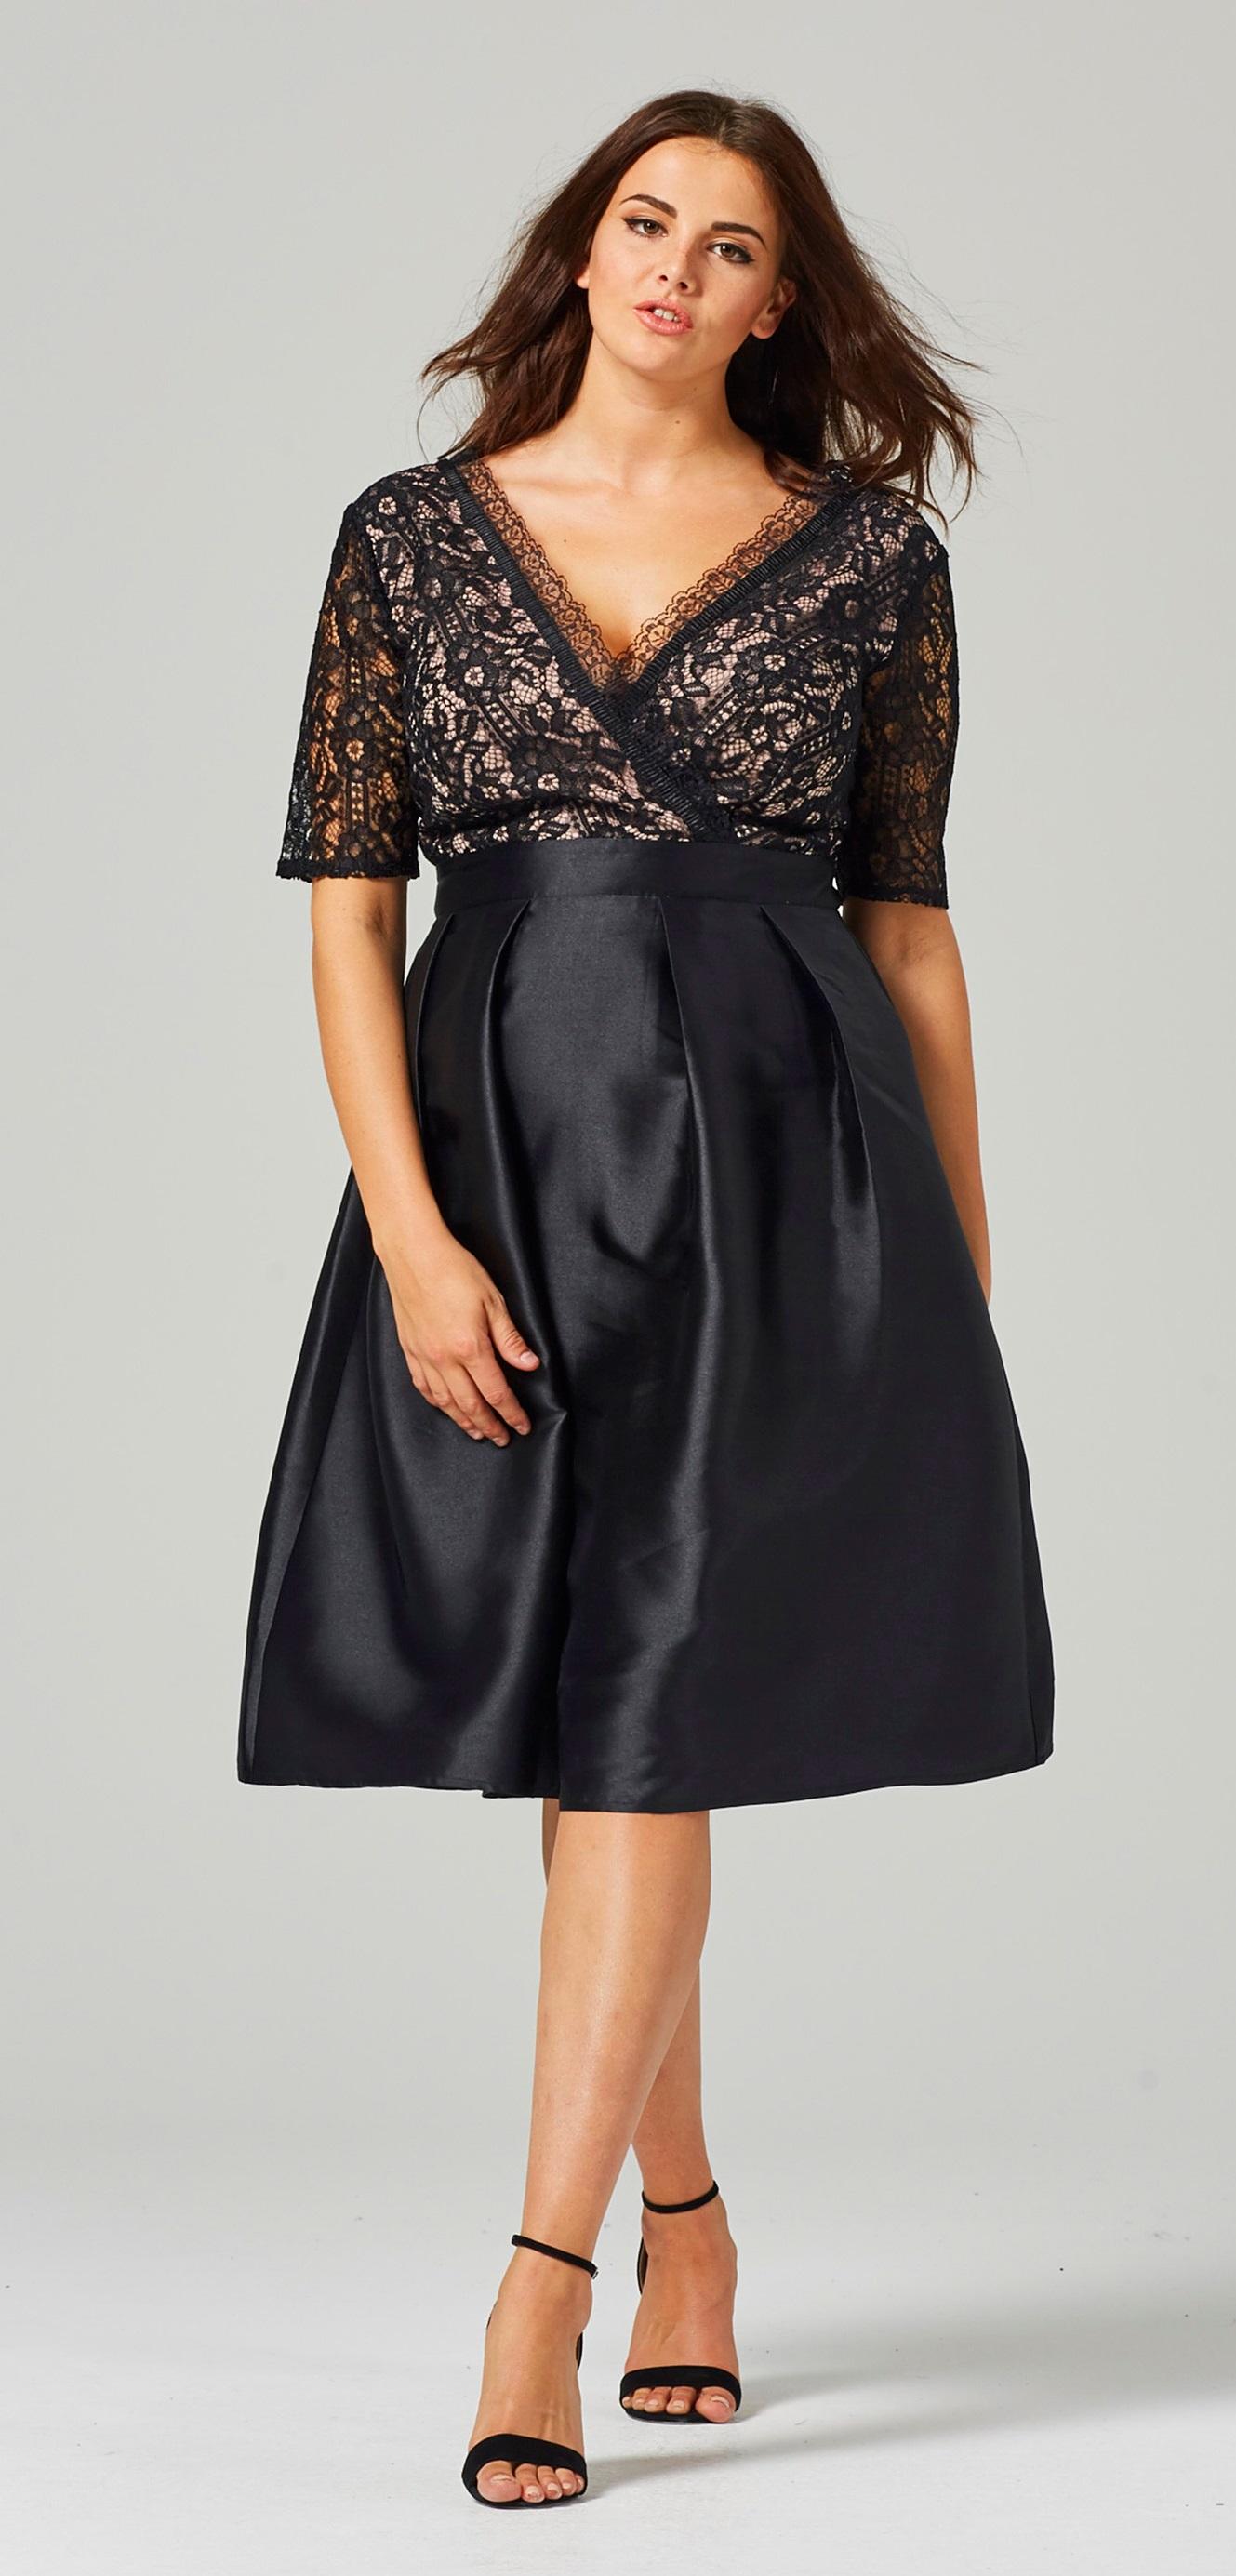 Plas Size Short Dresses for Evening Weddings